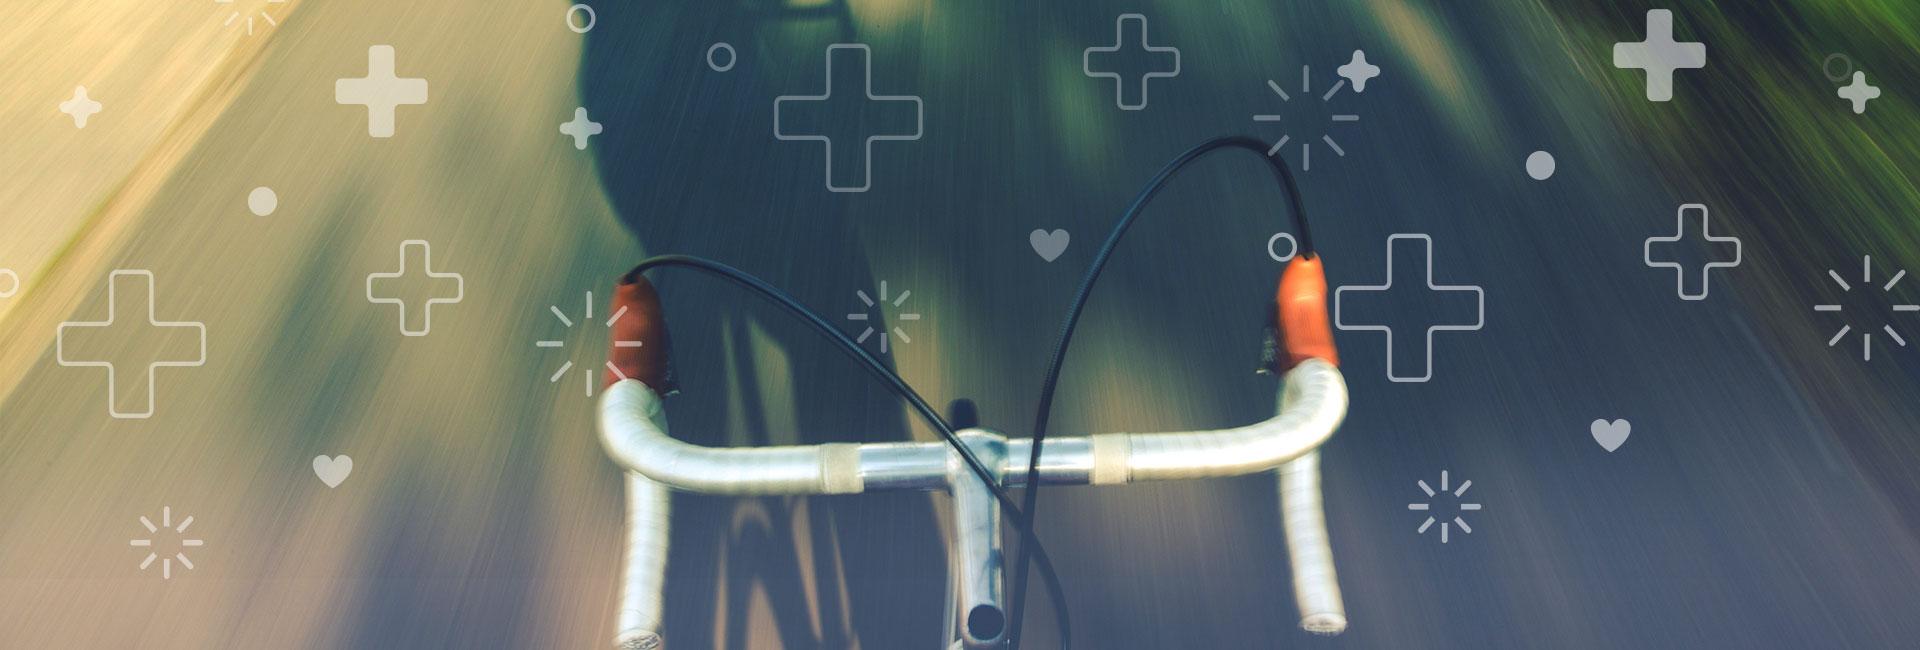 la bici un regalo saludable